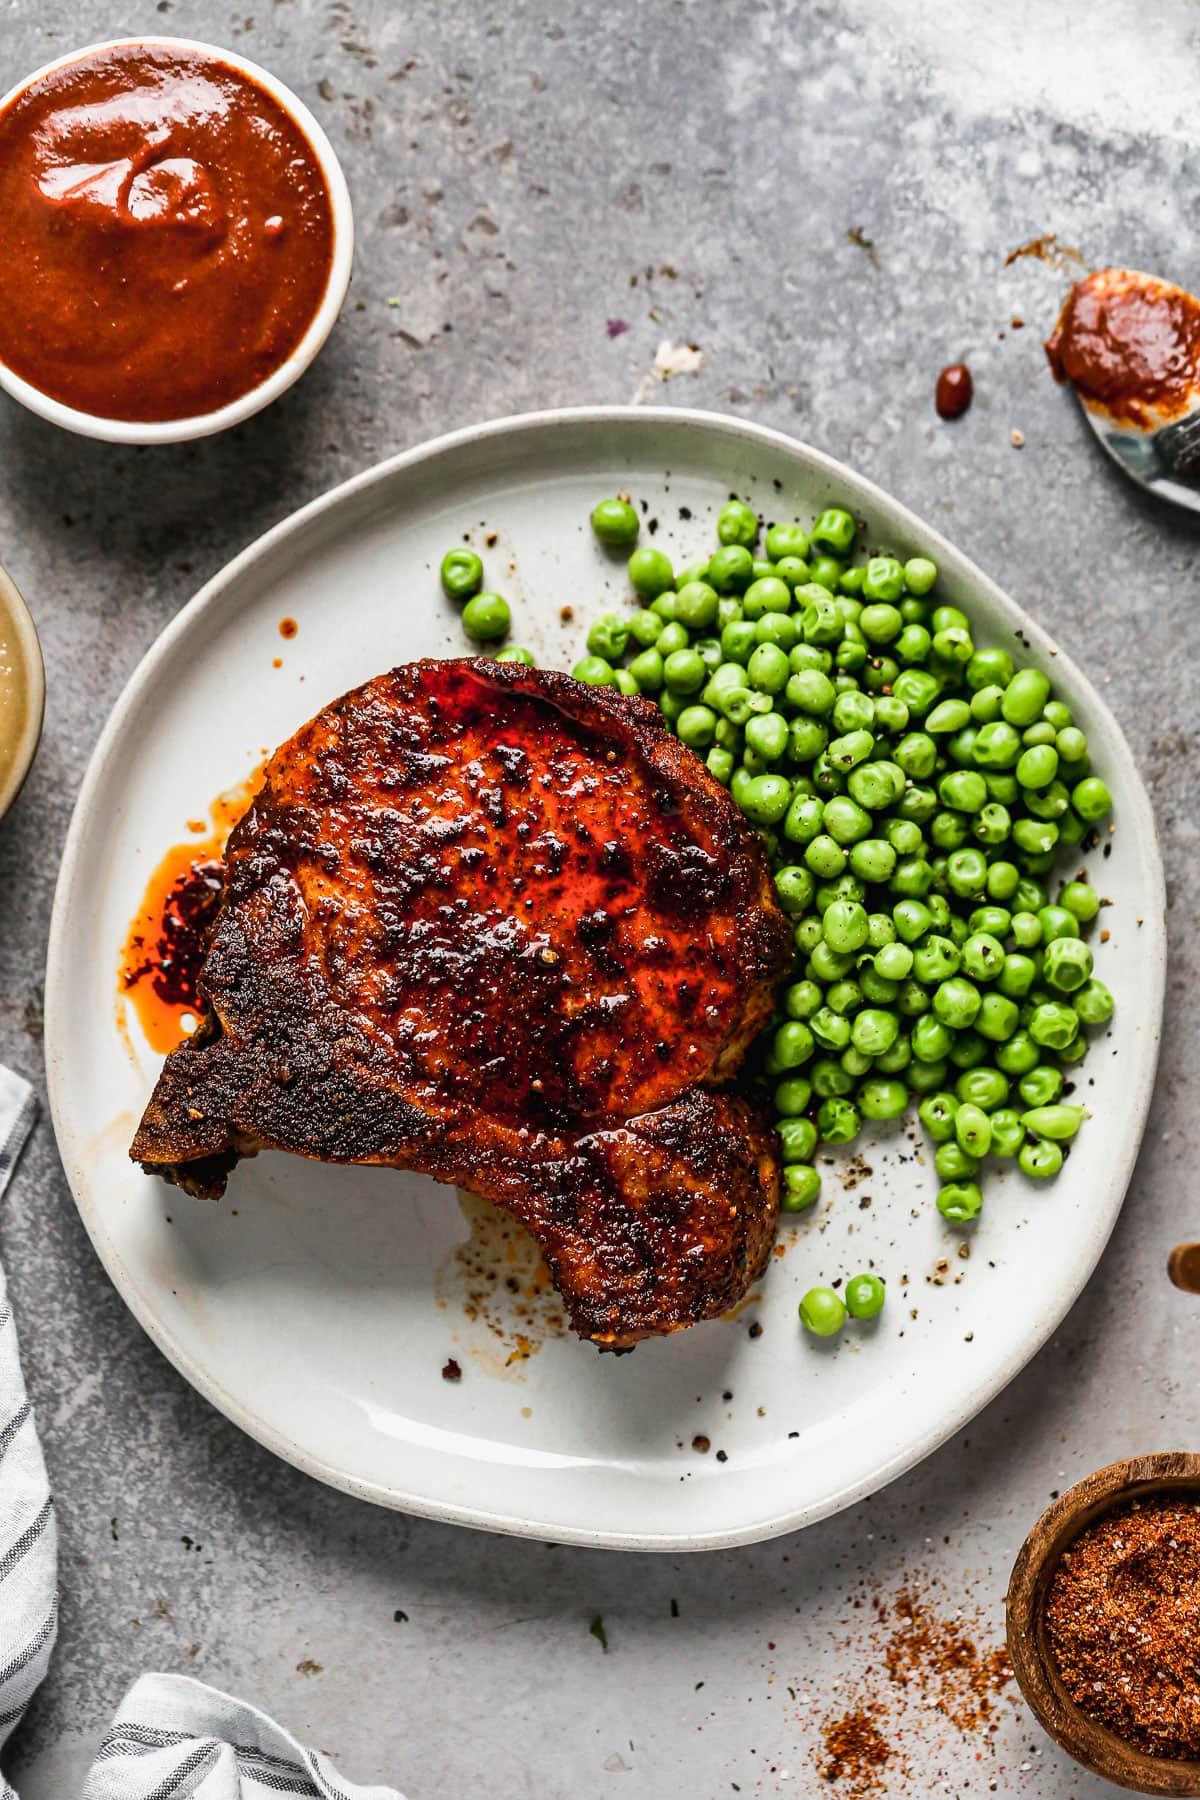 An air fryer pork chop with sauce and peas